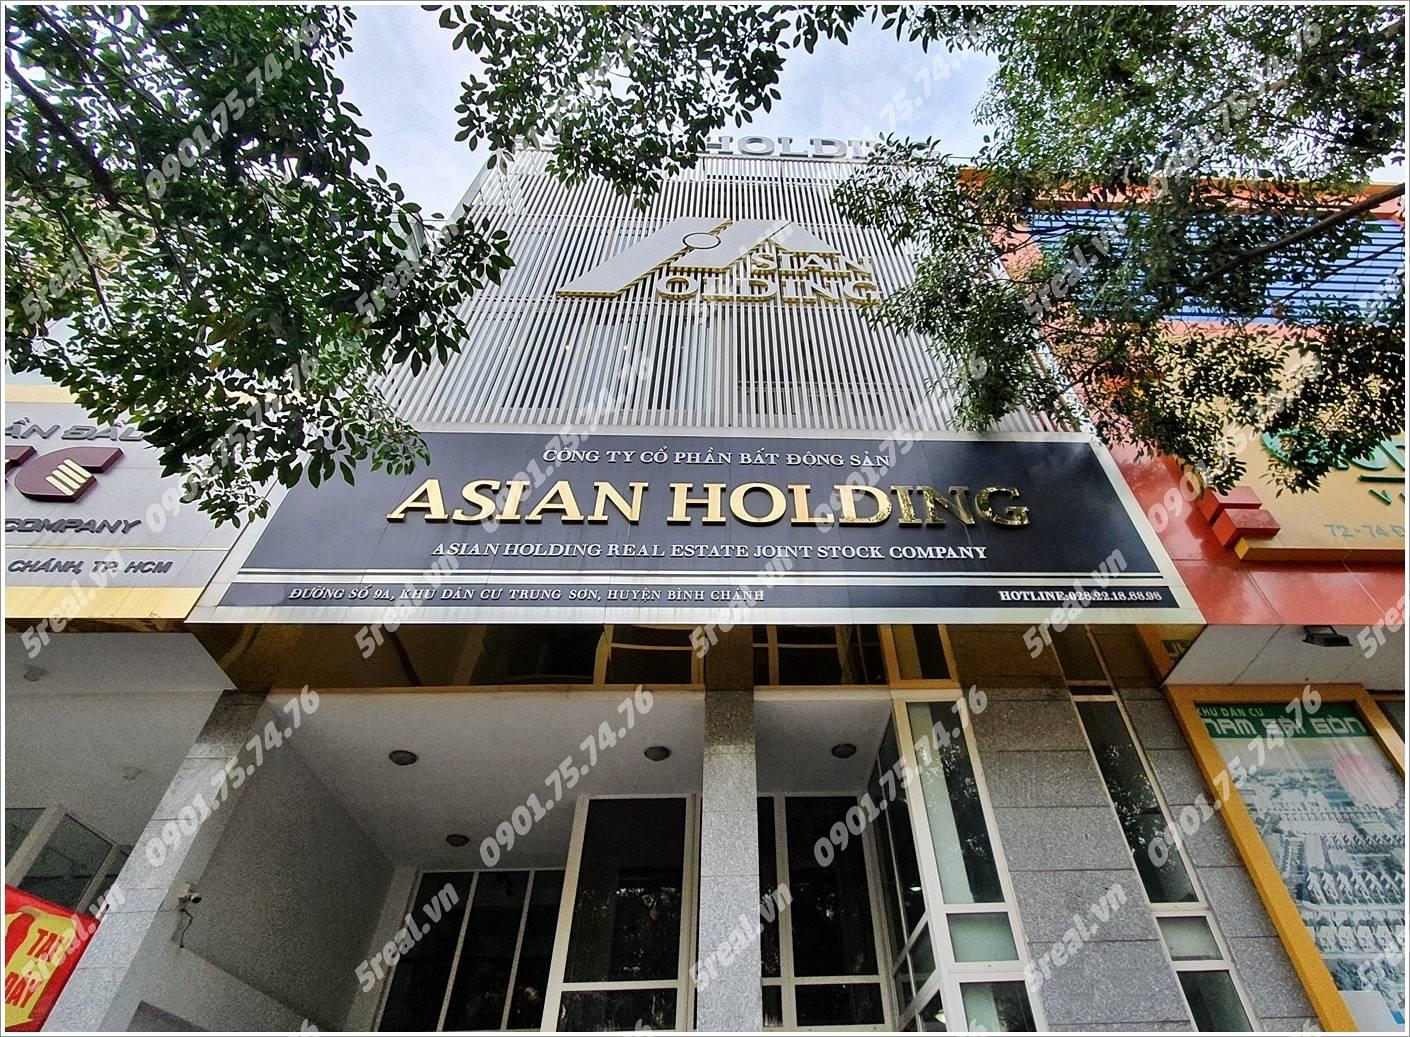 toa-nha-asian-holding-duong-so-9a-huyen-binh-chanh-van-phong-cho-thue-tphcm-5real.vn-01